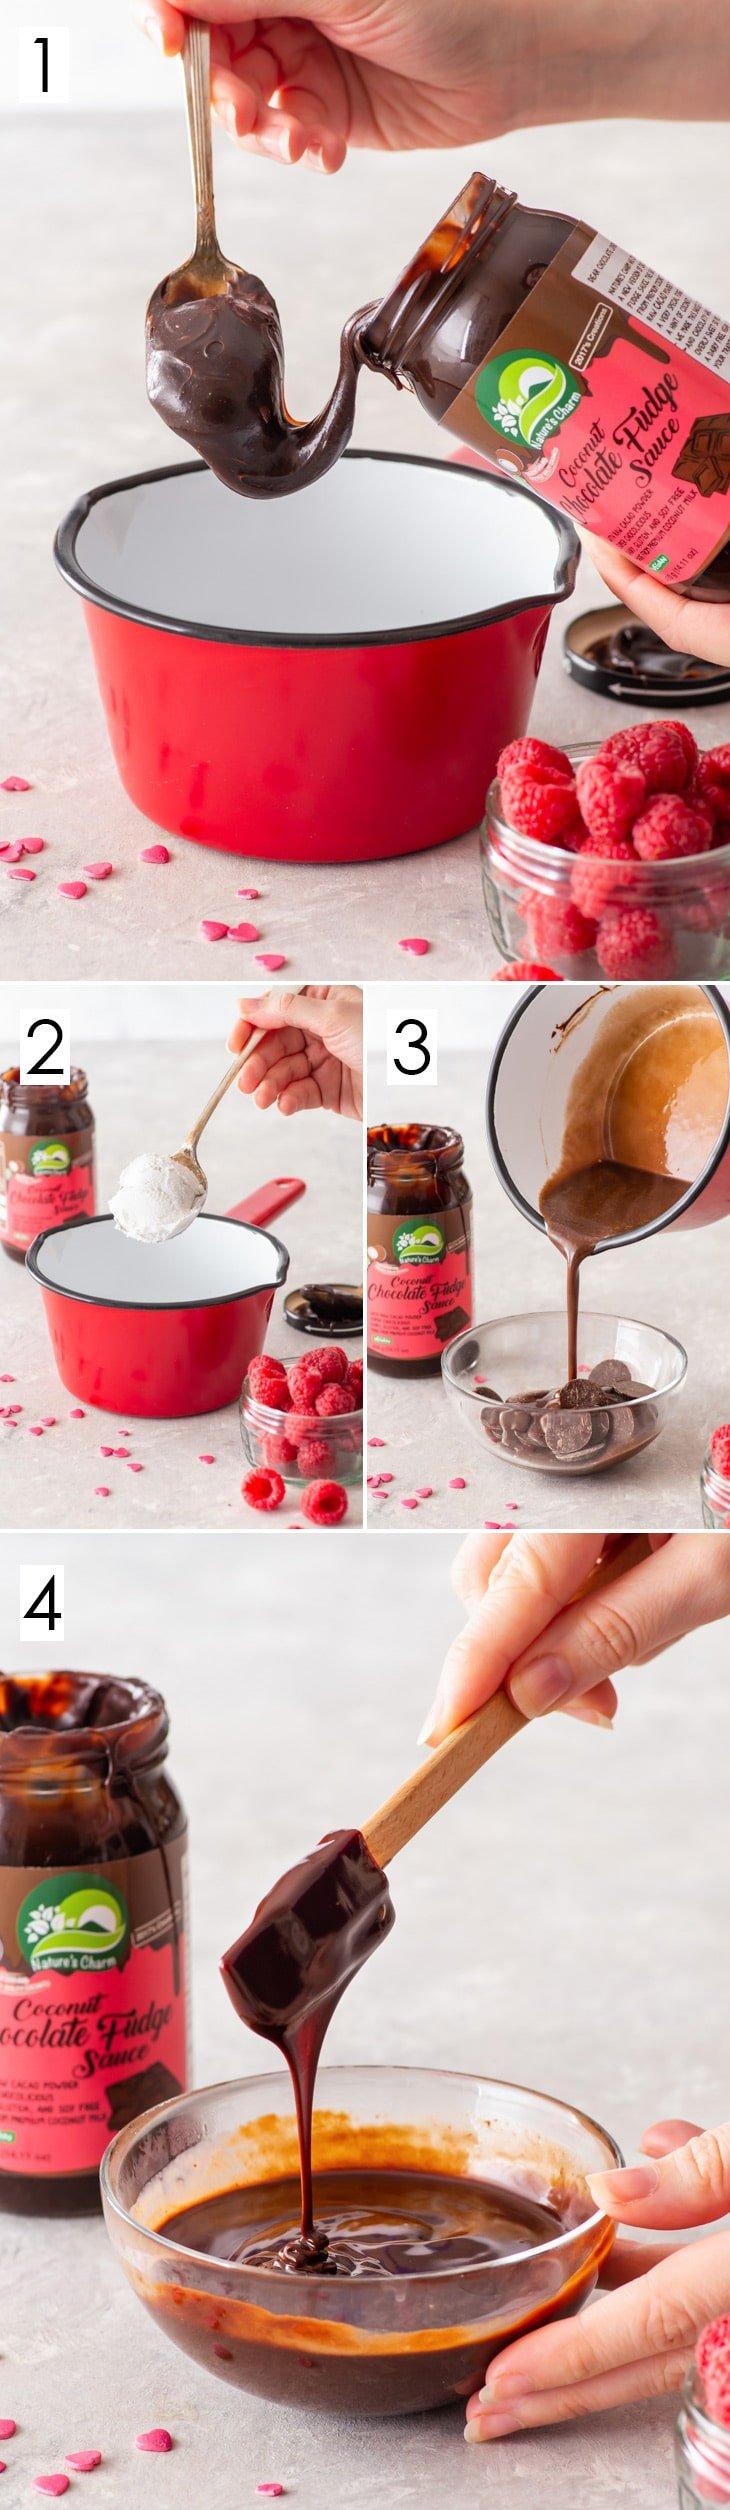 4-step process of making the vegan chocolate ganache drip.